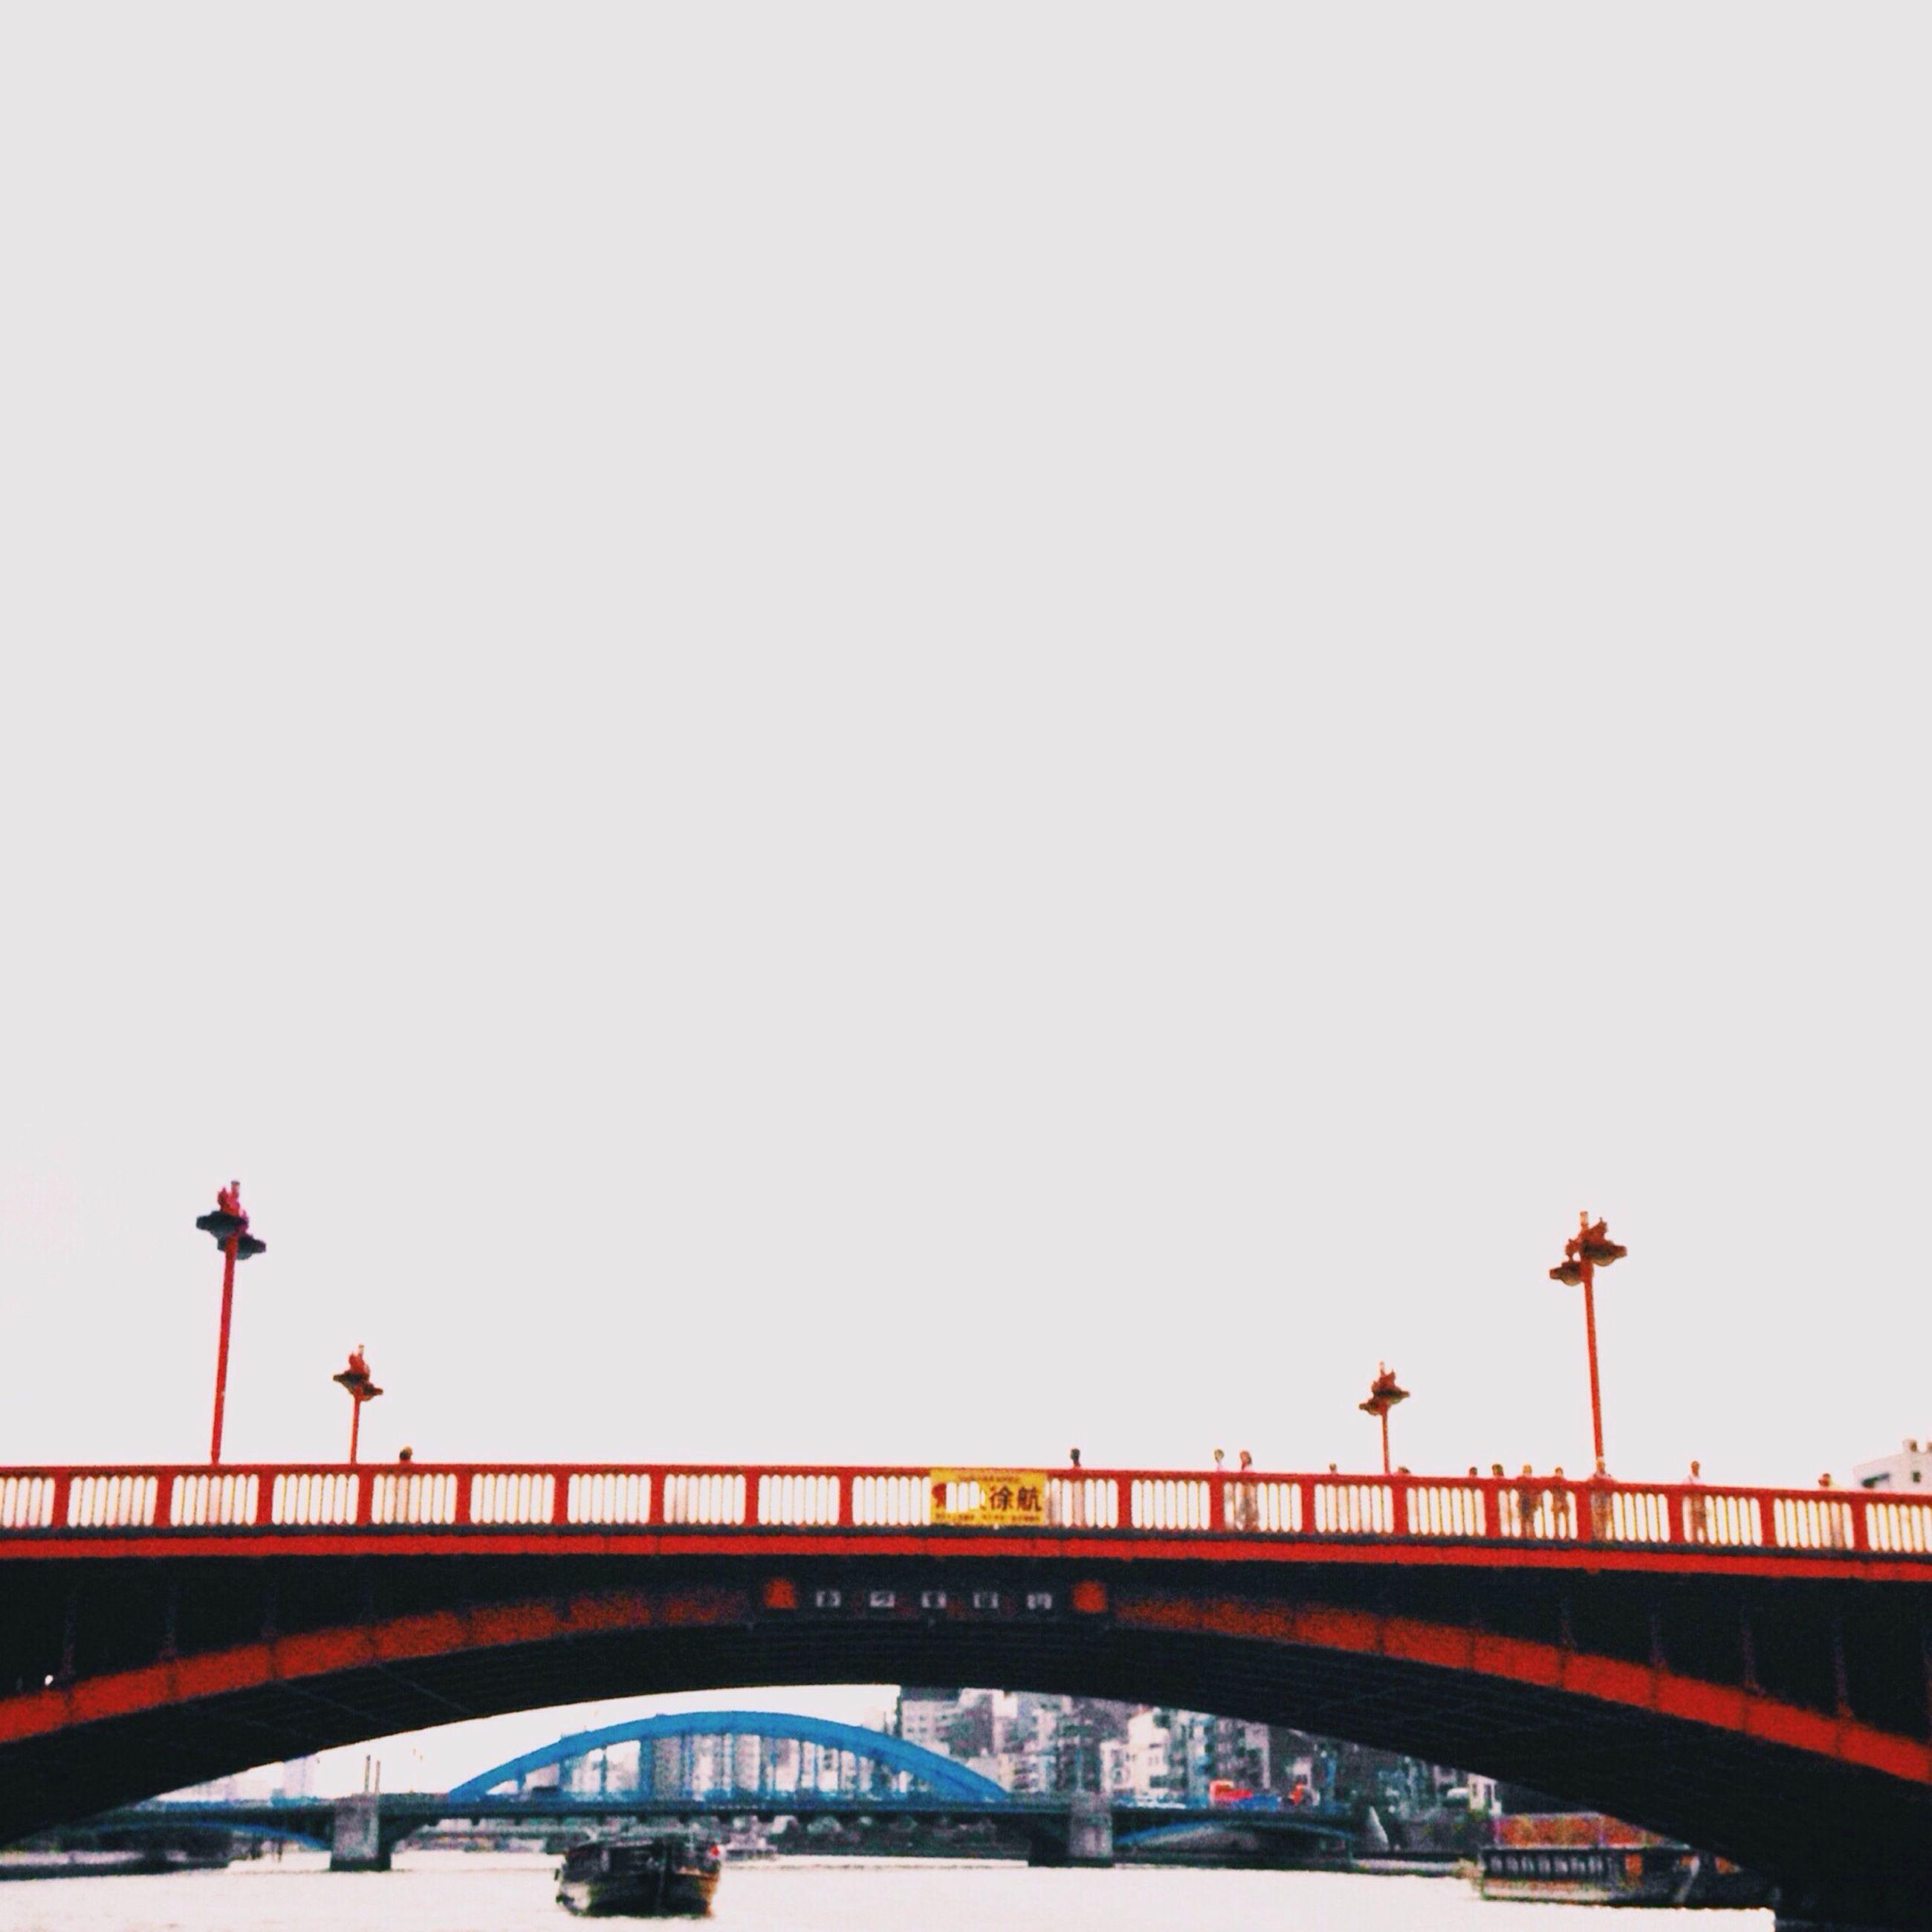 transportation, clear sky, bridge - man made structure, built structure, architecture, copy space, connection, mode of transport, engineering, bridge, travel, railing, low angle view, travel destinations, street light, land vehicle, public transportation, city, outdoors, suspension bridge